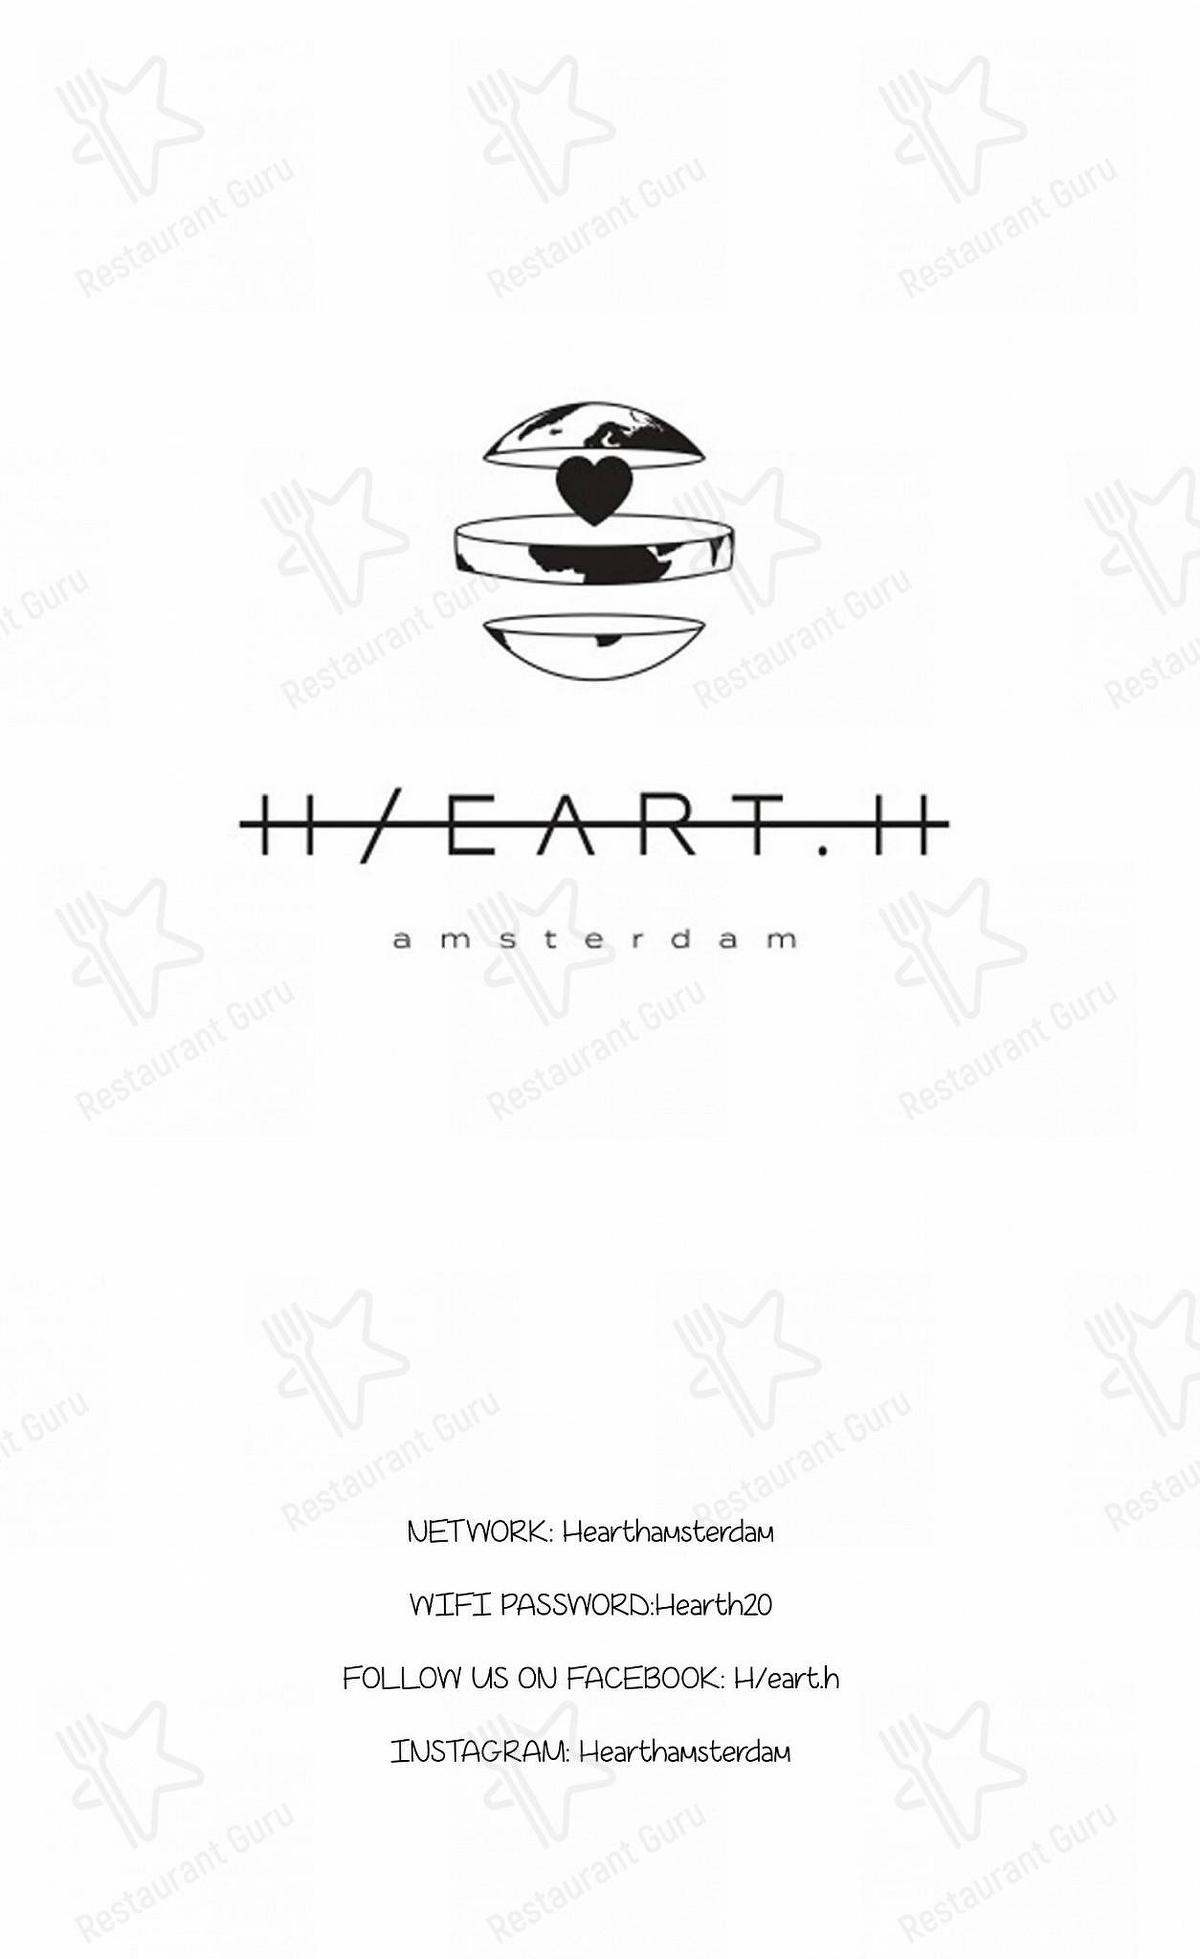 Carta de Hearth